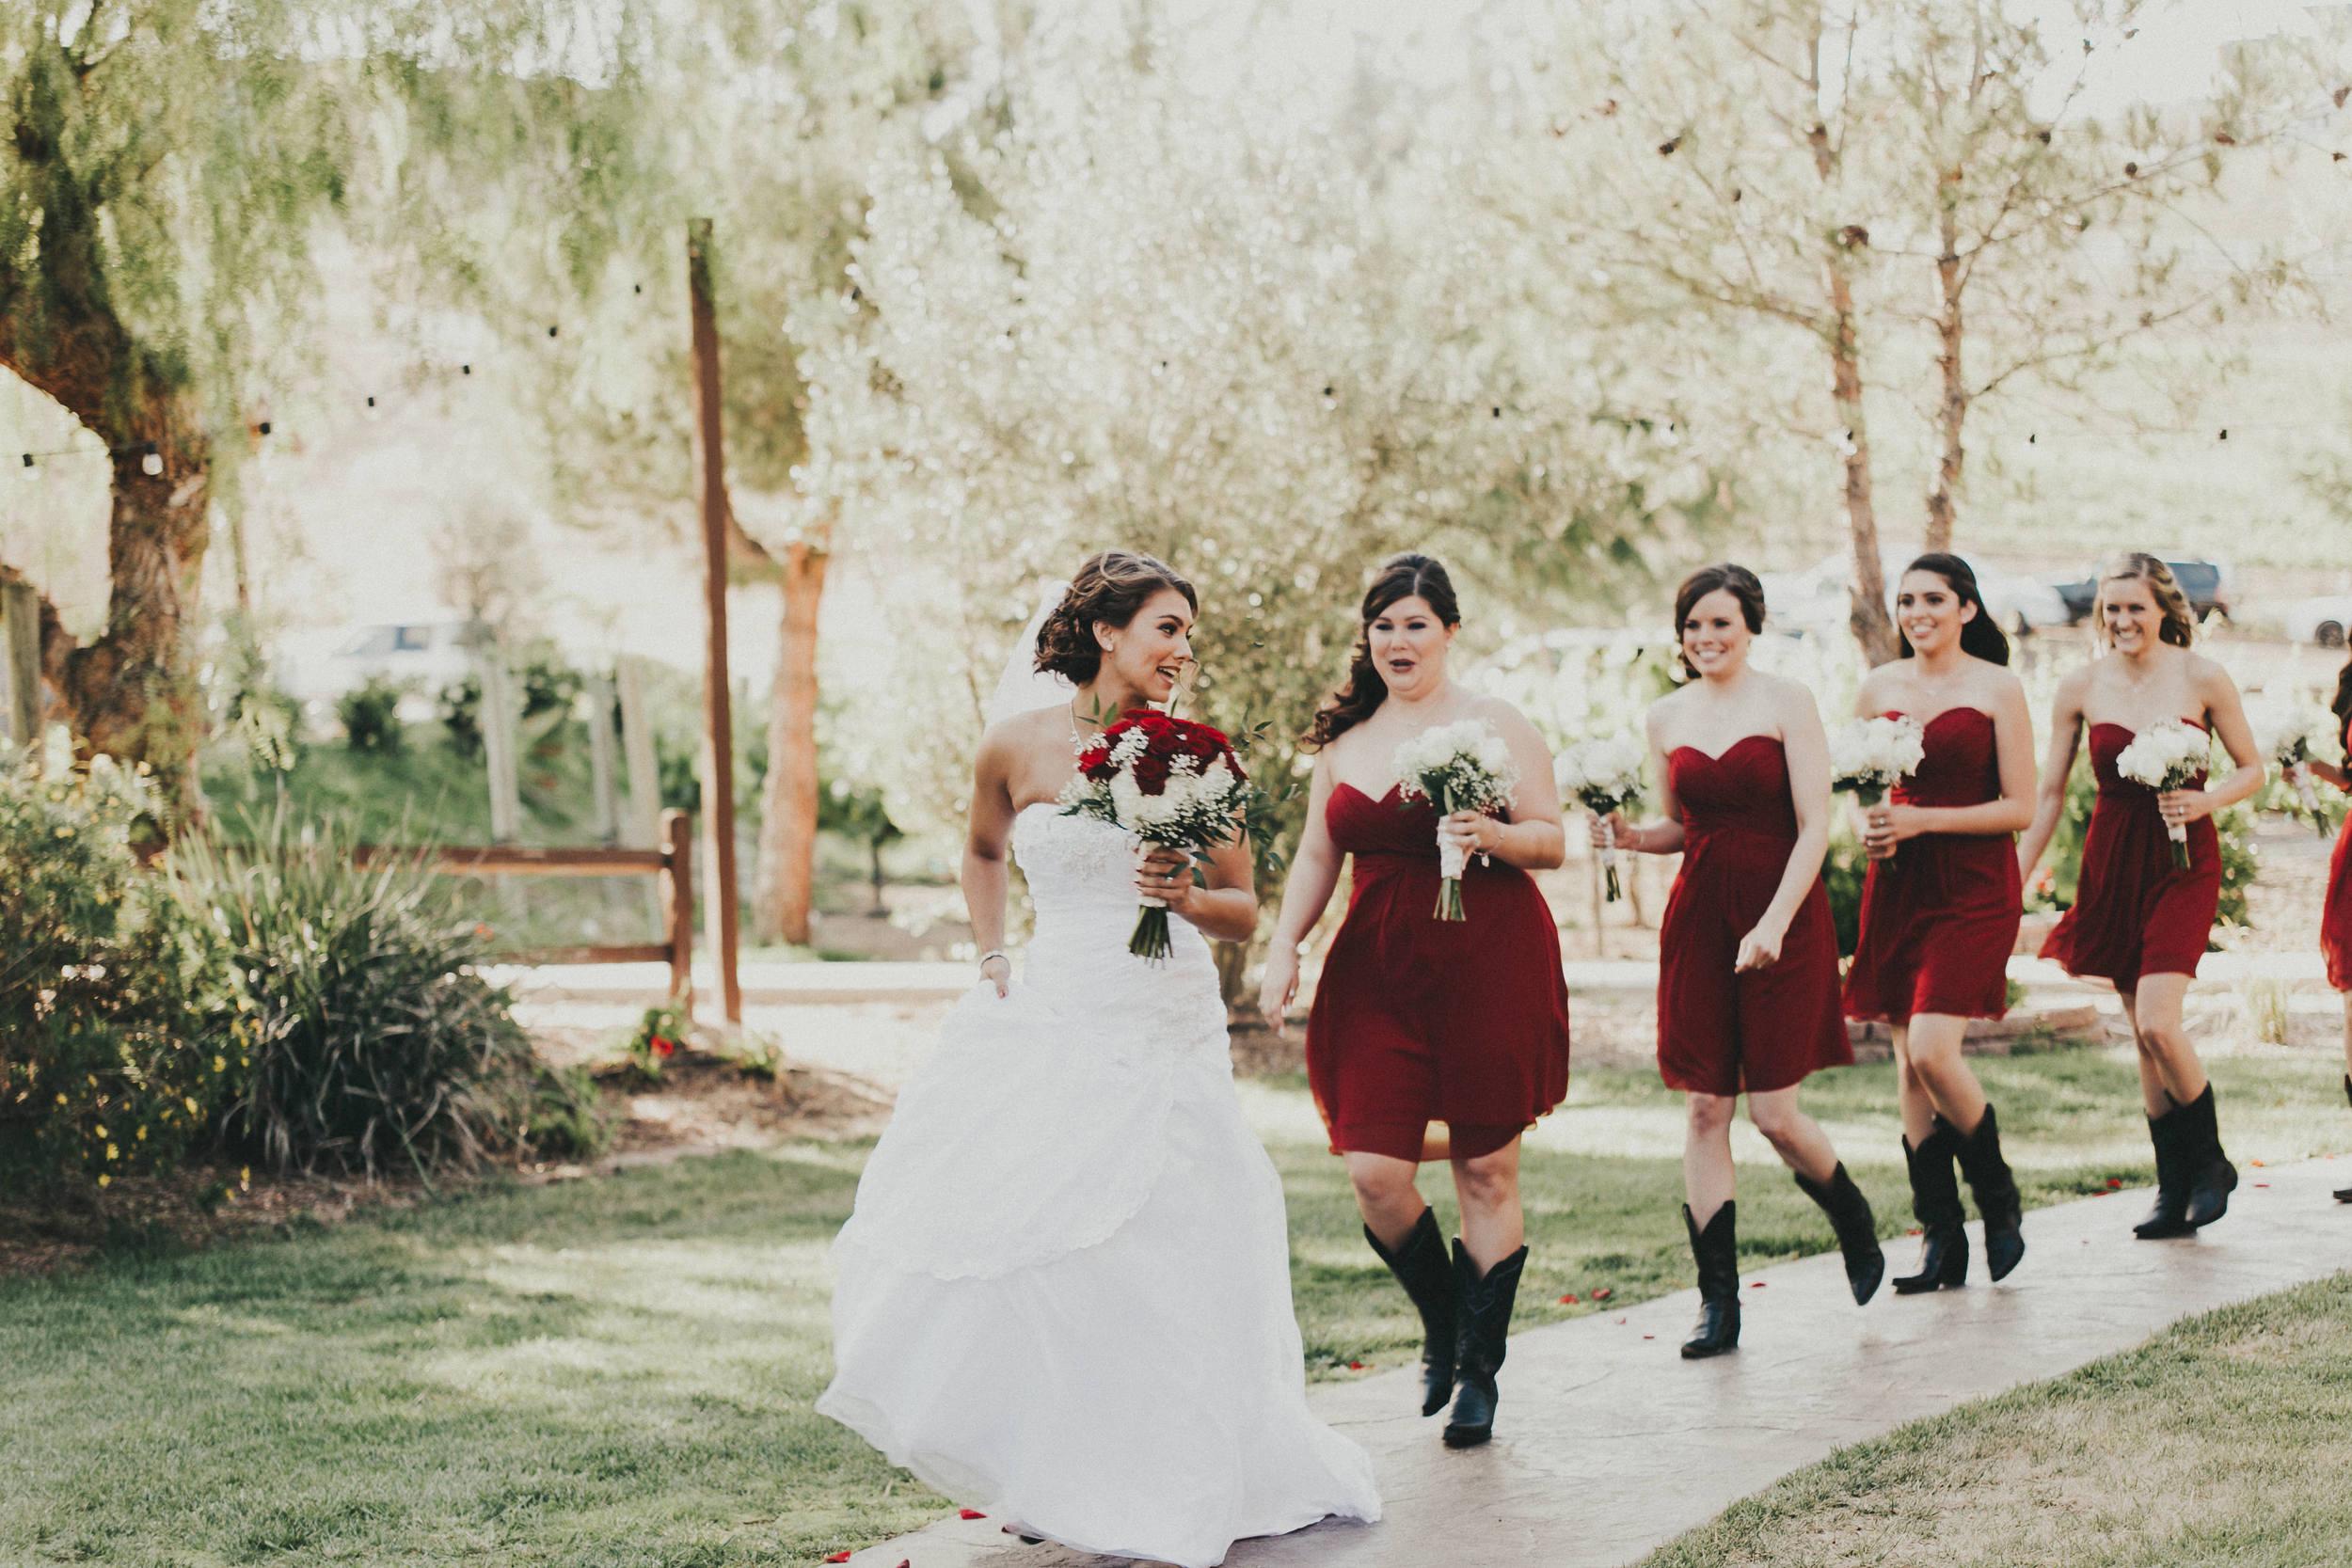 Cheyenne + Jordan - Wedding, Natalie Griffo (49 of 157).jpg